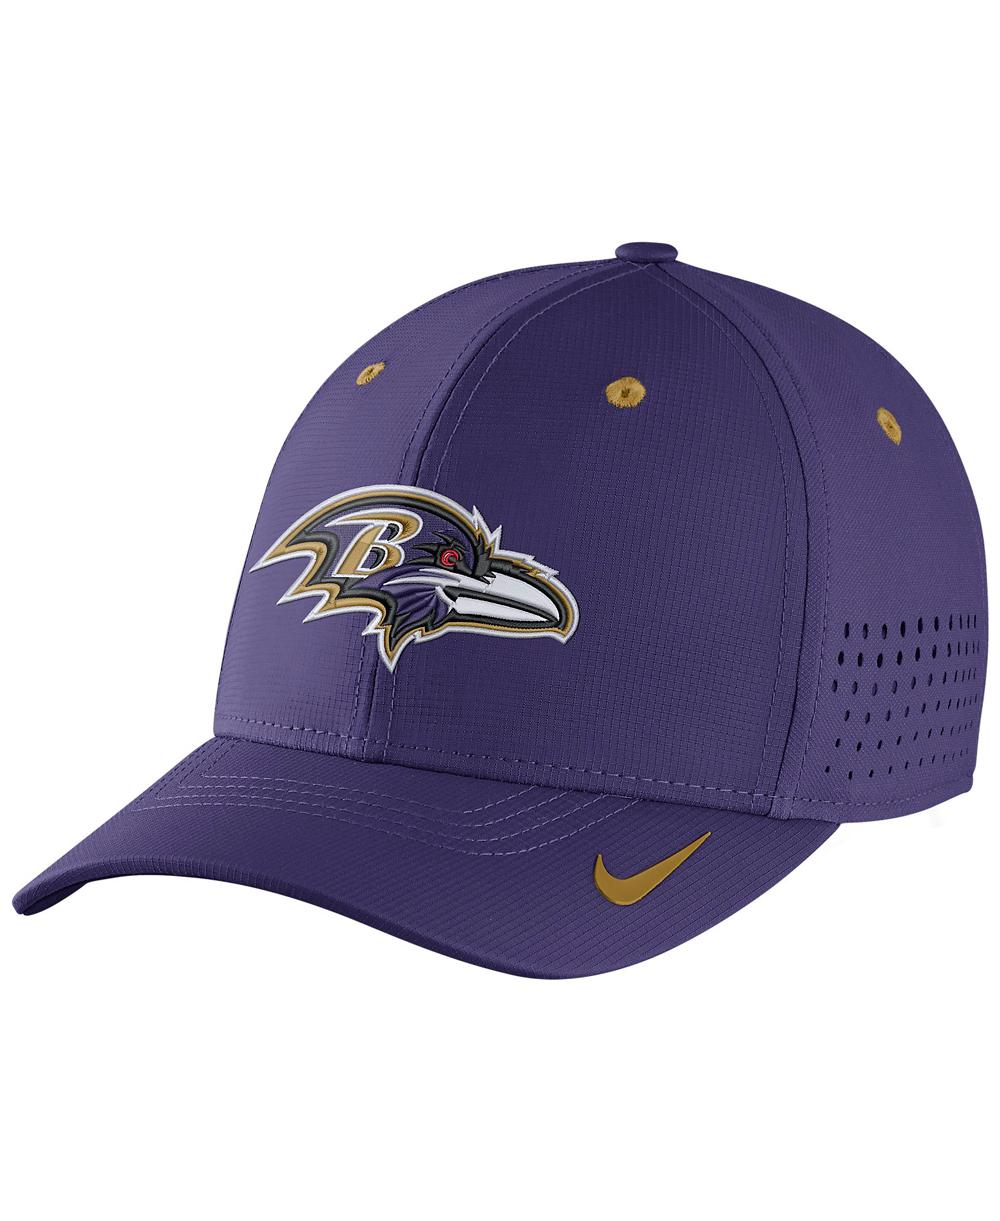 Legacy Vapor Swoosh Flex Cappellino Uomo NFL Ravens